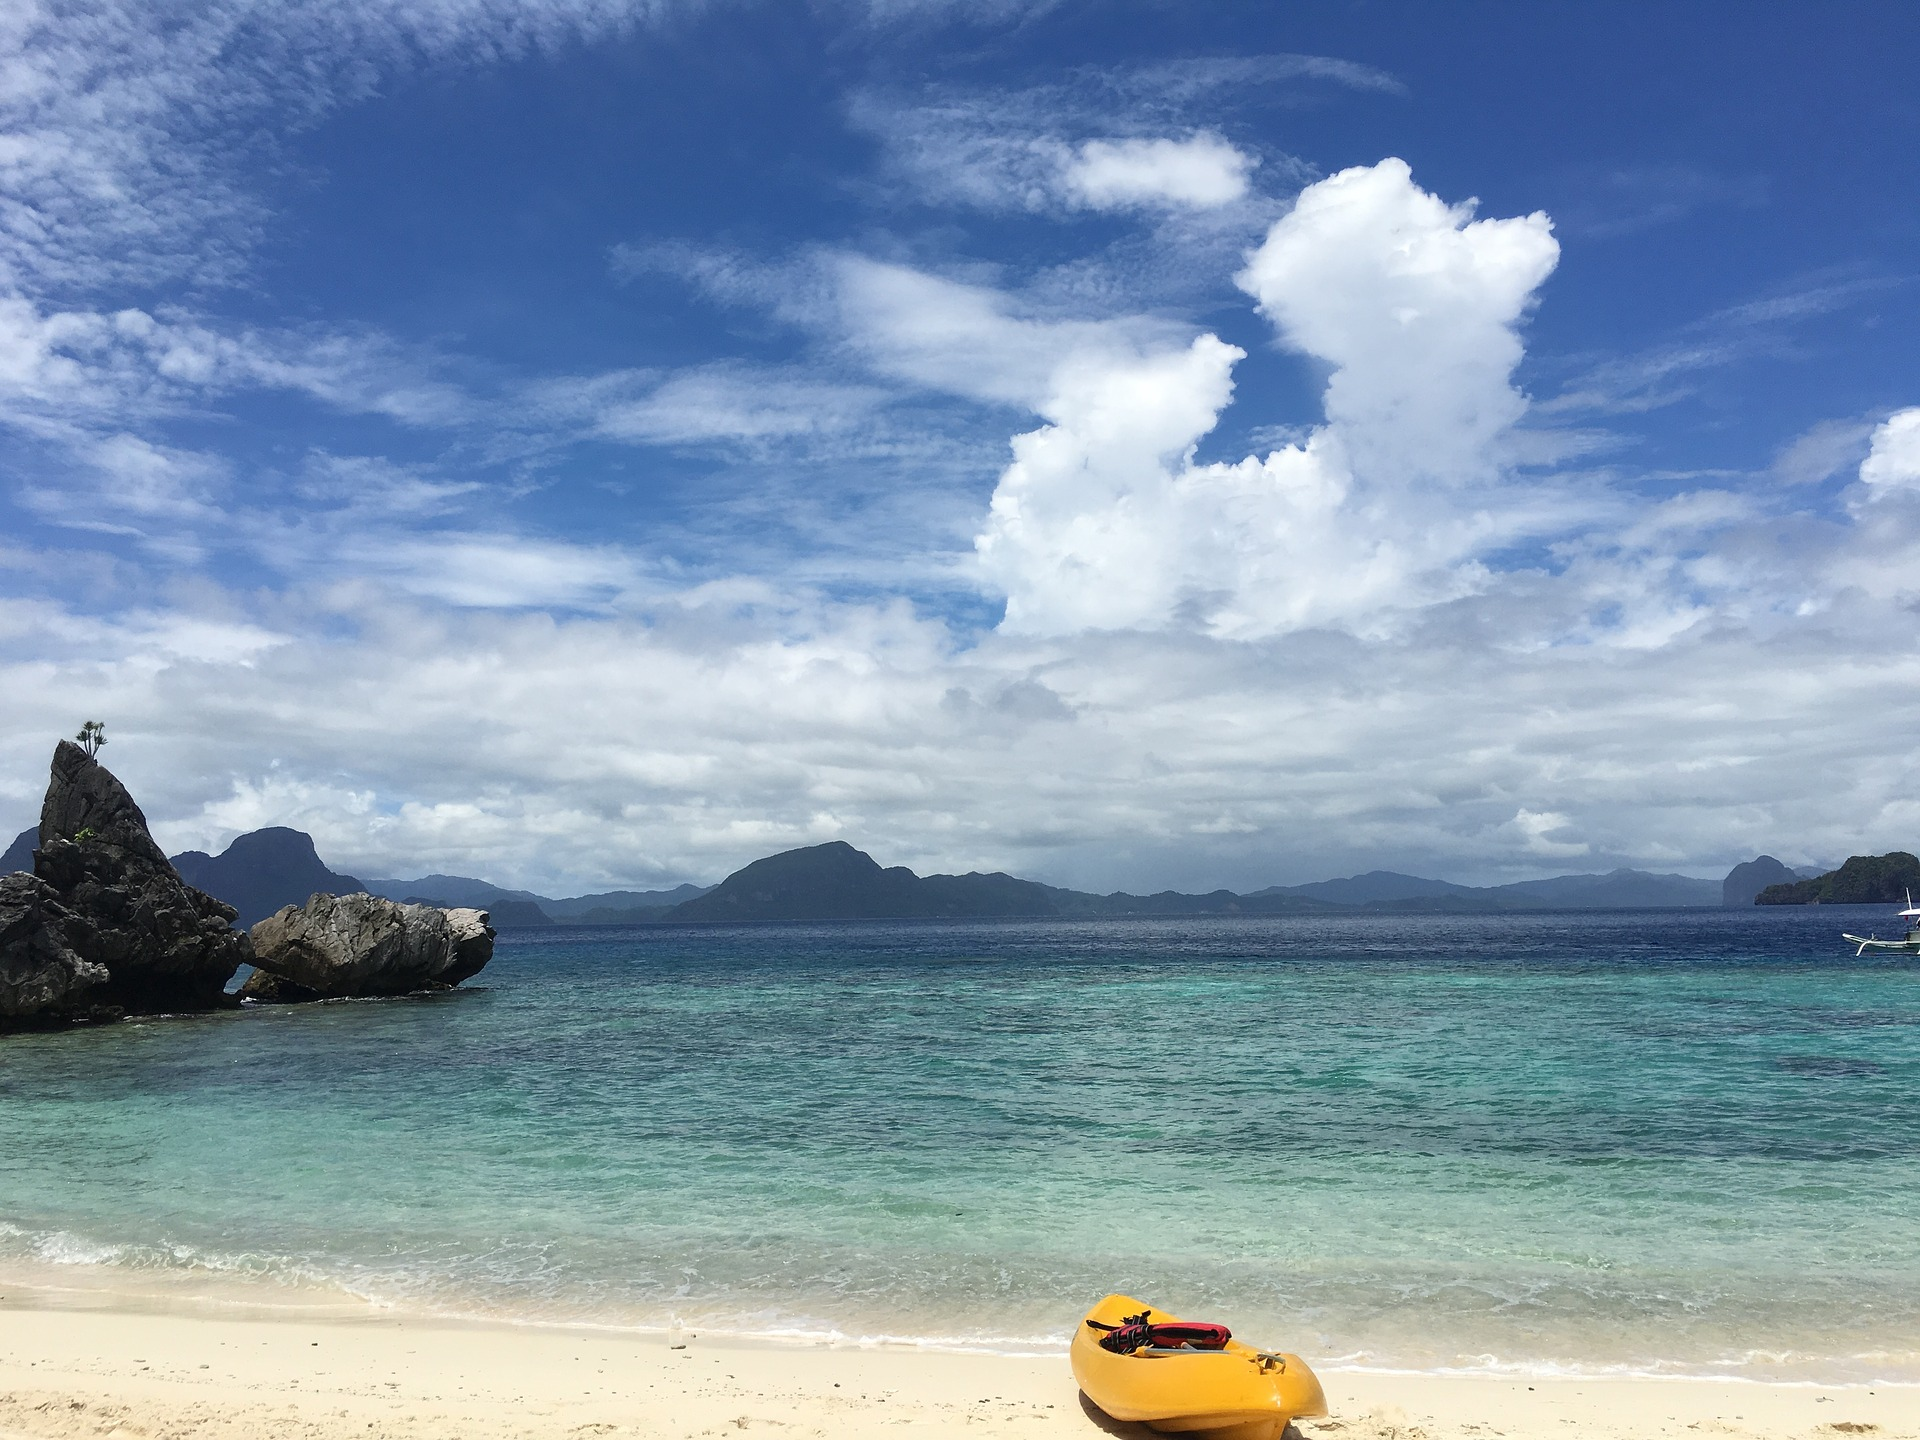 Beach in Palawan, Philippines